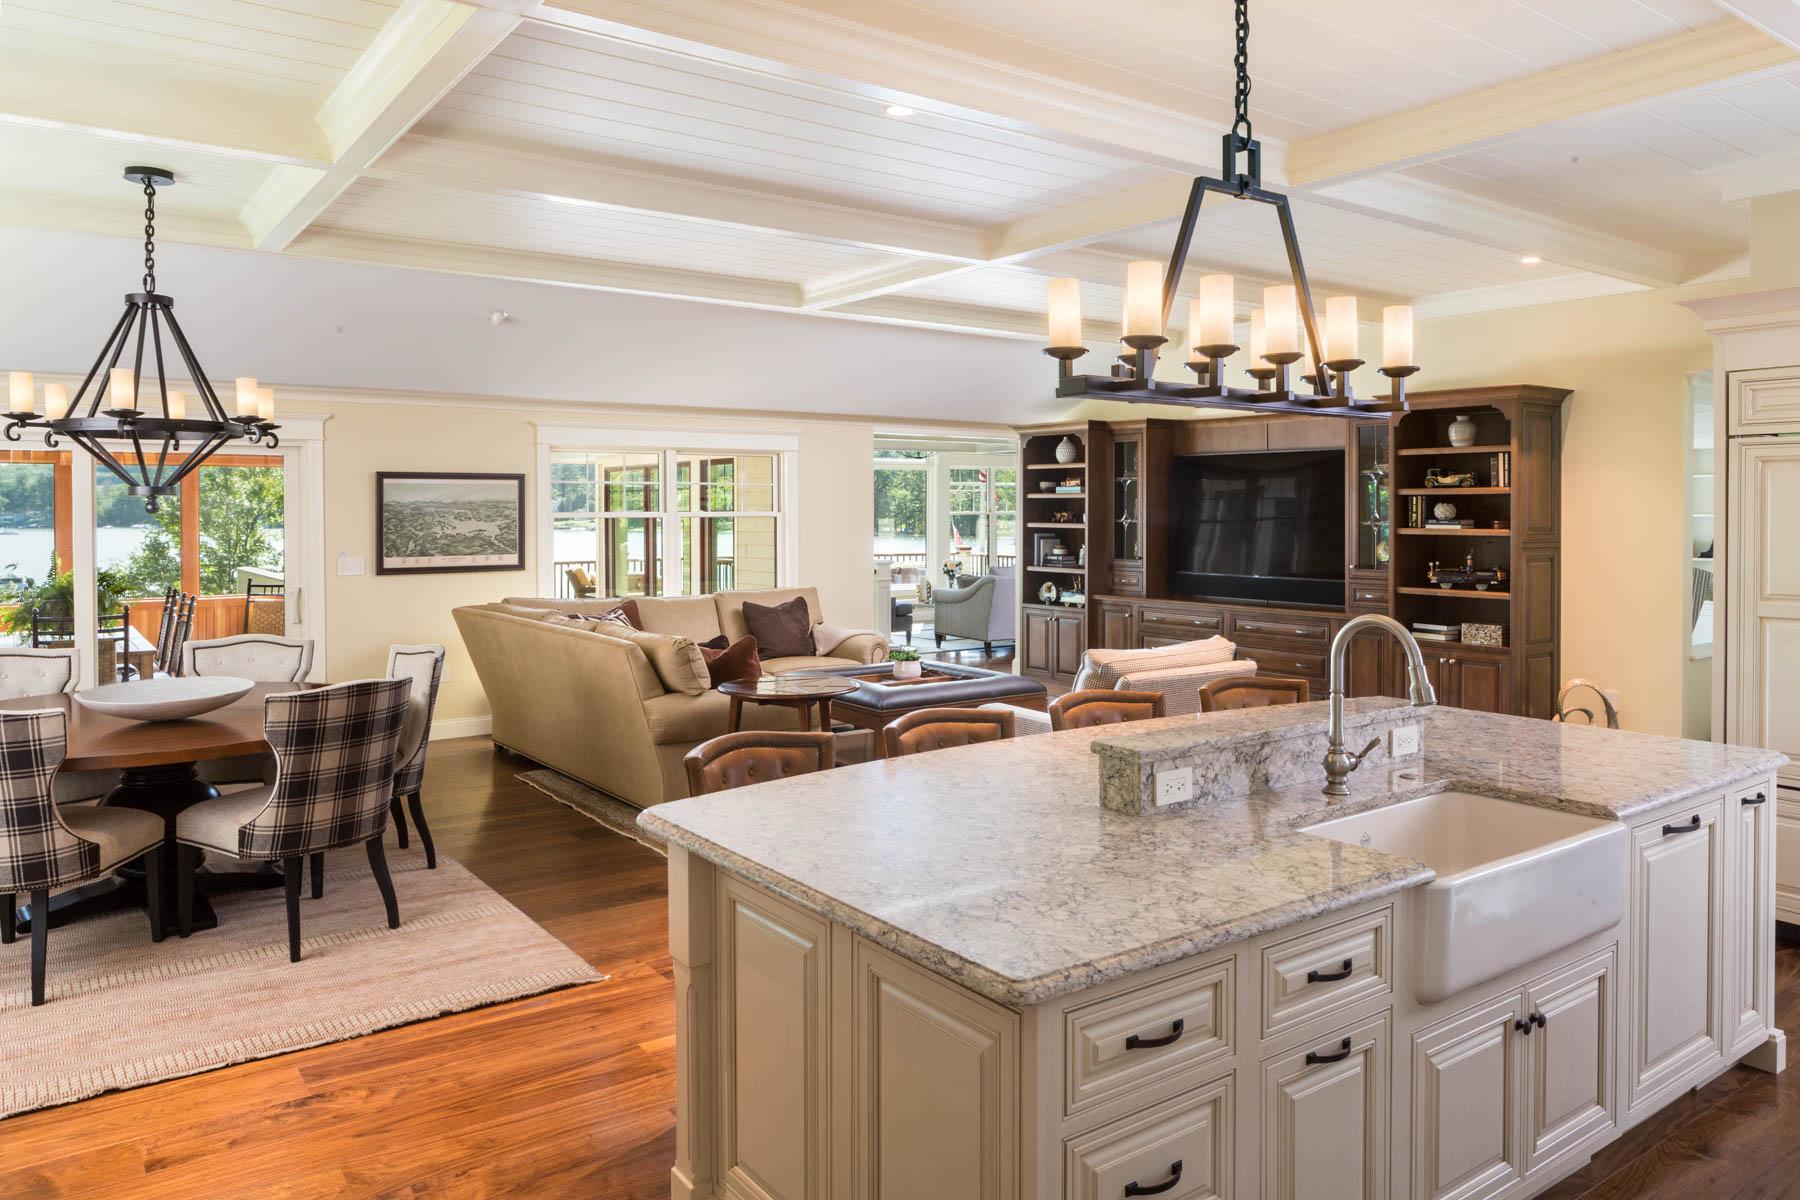 Best Interior Design Lakes Region Parade of Homes